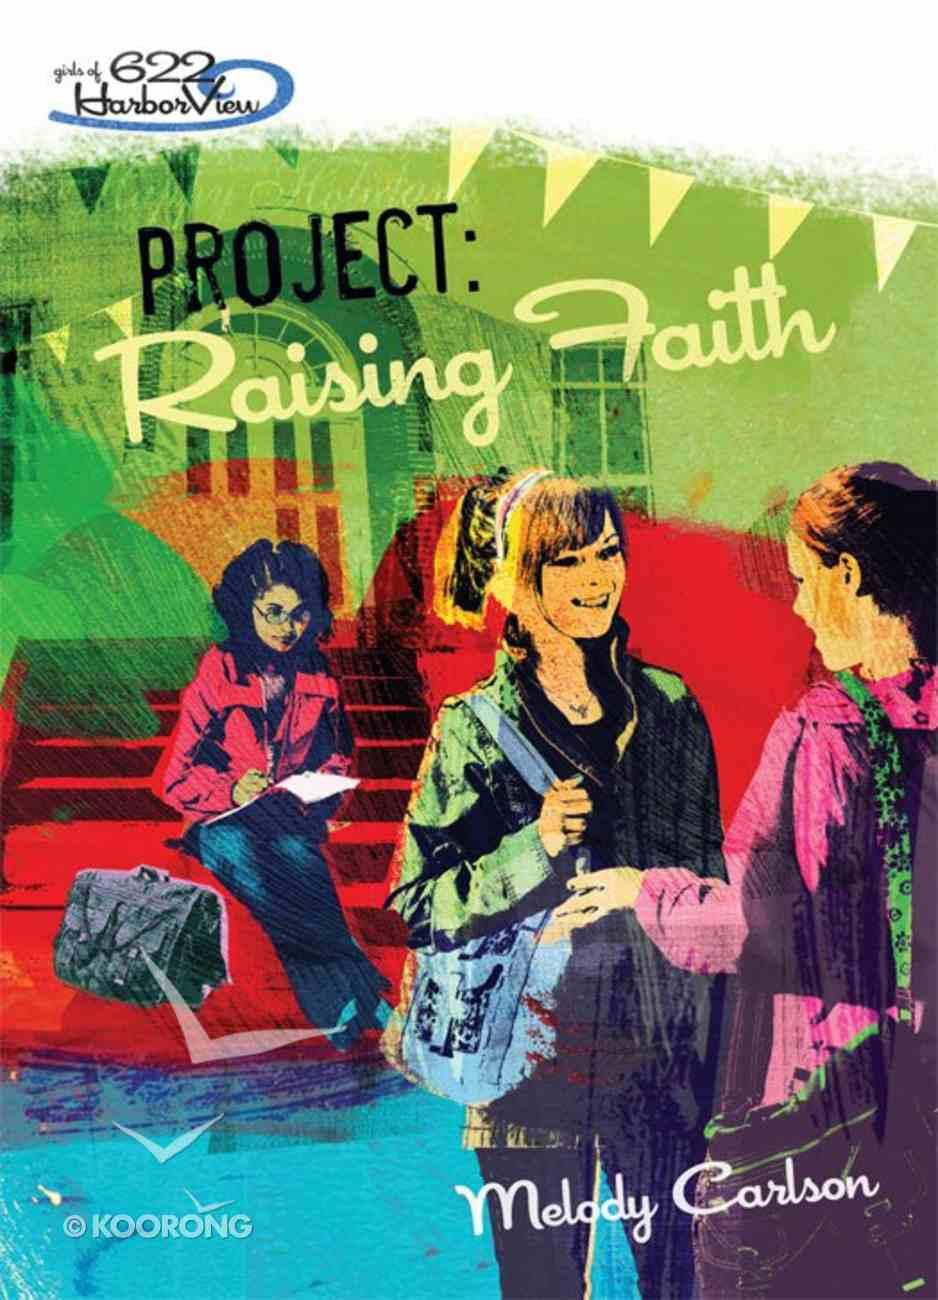 Faithgirlz! Girls of 622 Harbor View #05: Project Raising Faith (#05 in Faithgirlz! Harbor View: Project Series) eBook